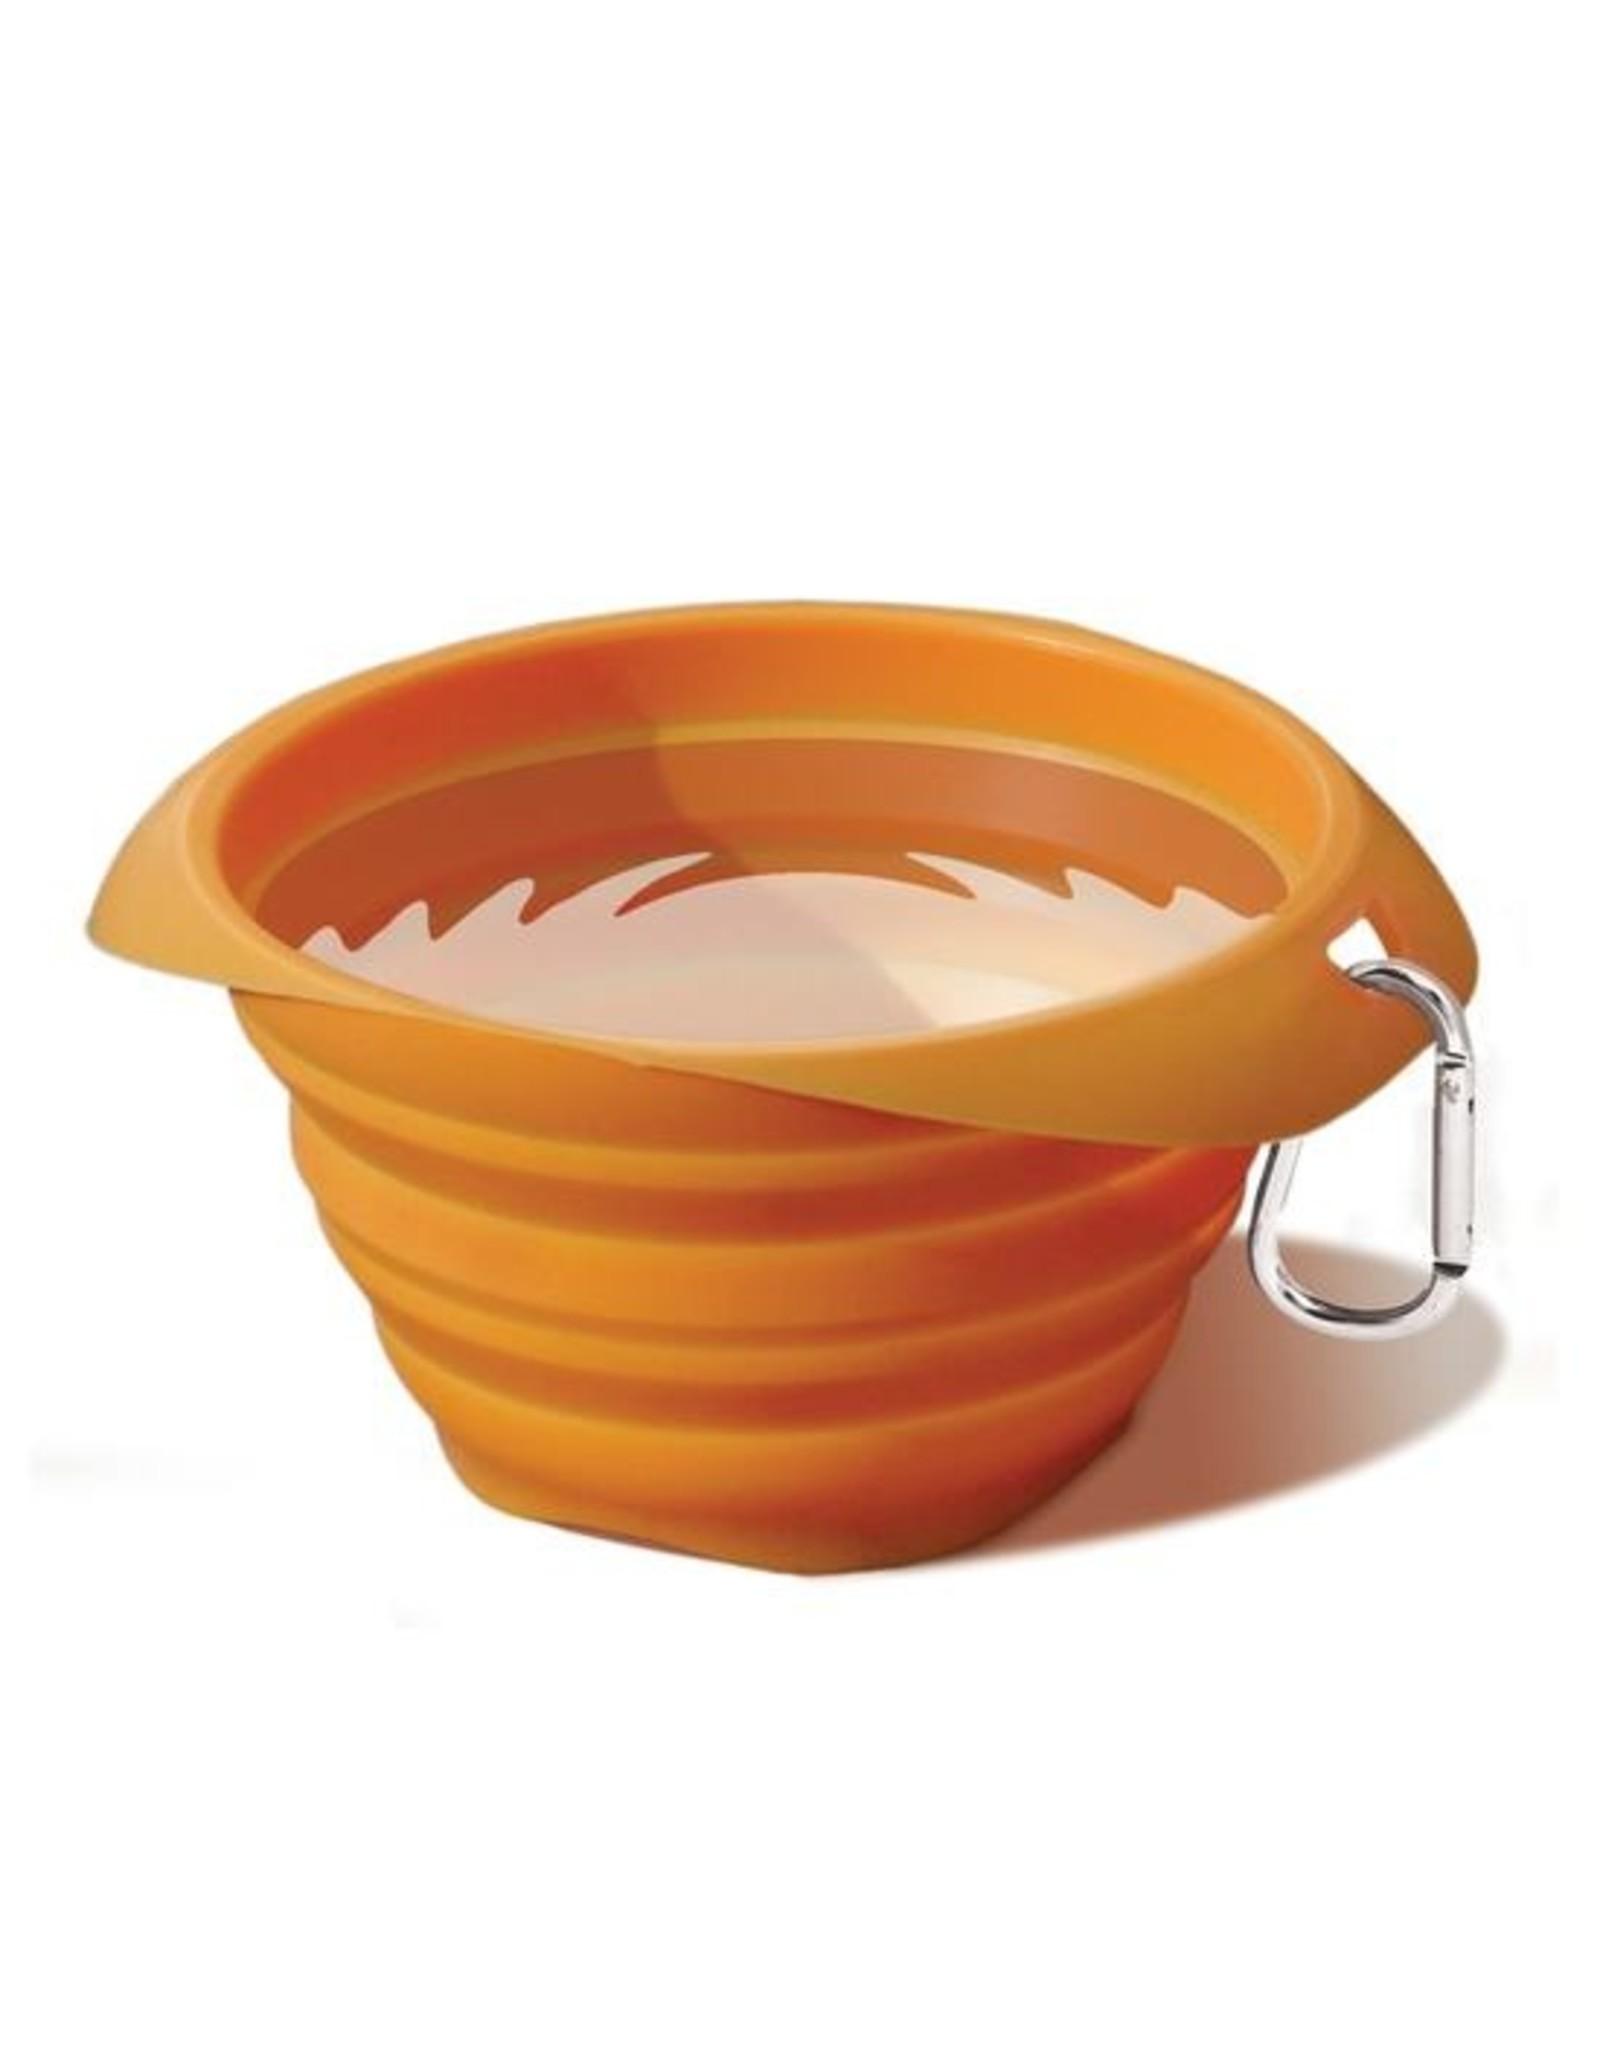 Kurgo Kurgo Collaps-a-Bowl Collapsible Silicone Travel Bowl